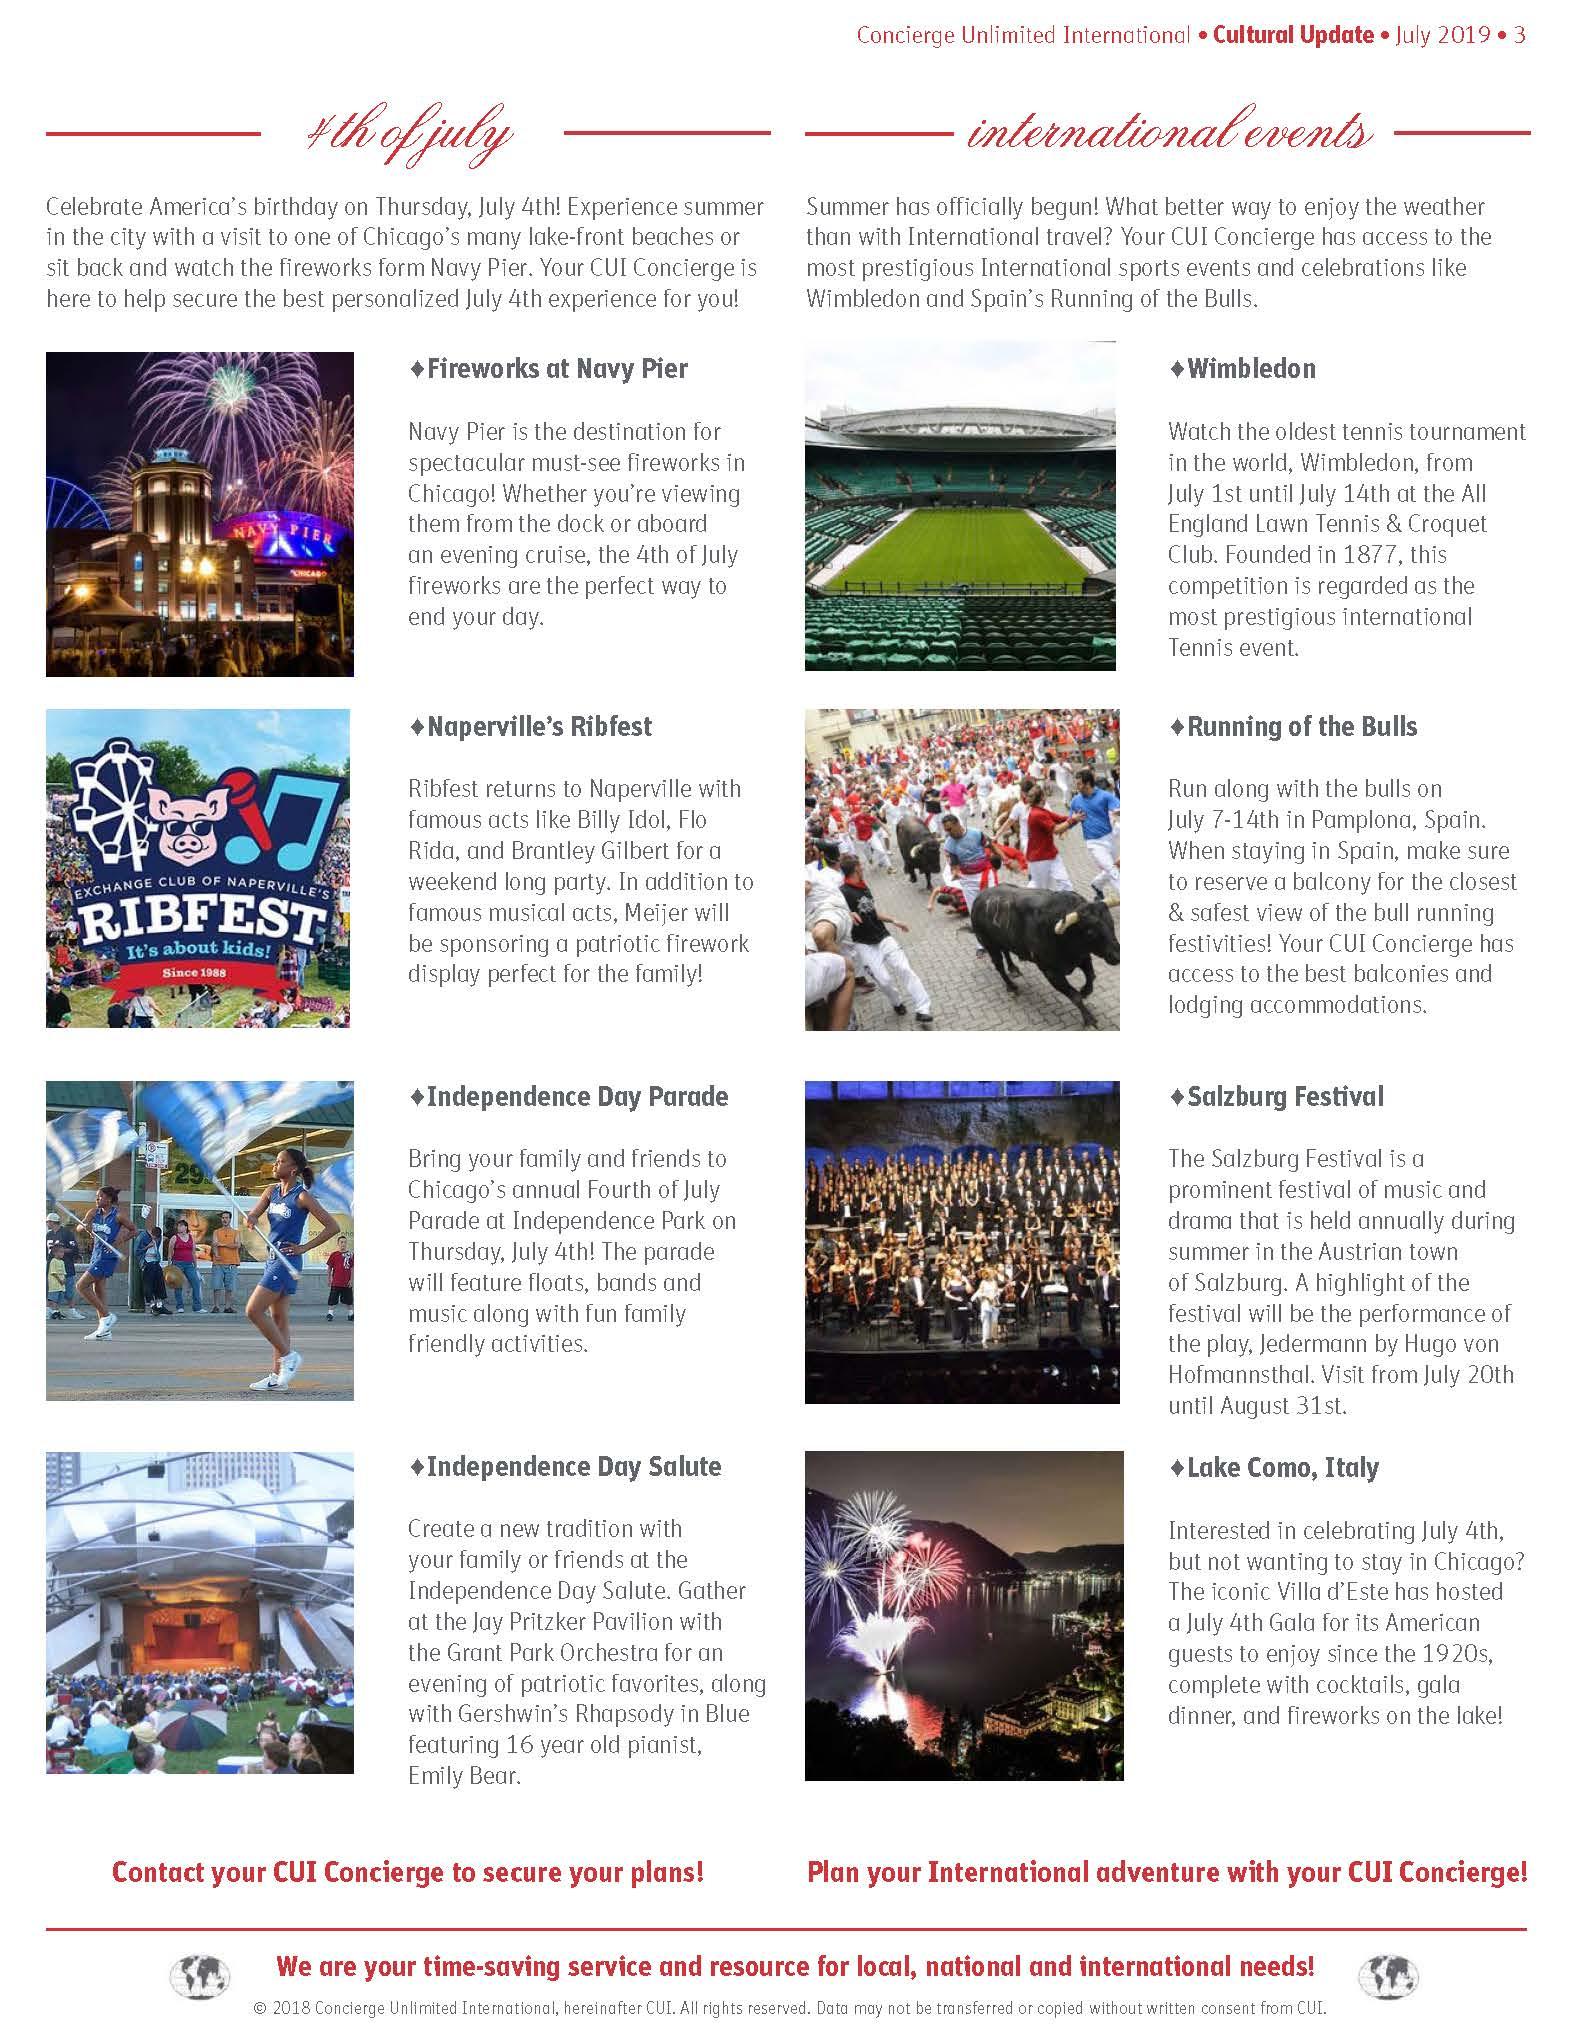 NWOC - July Cultural Update- Event Calendar_Page_3.jpg